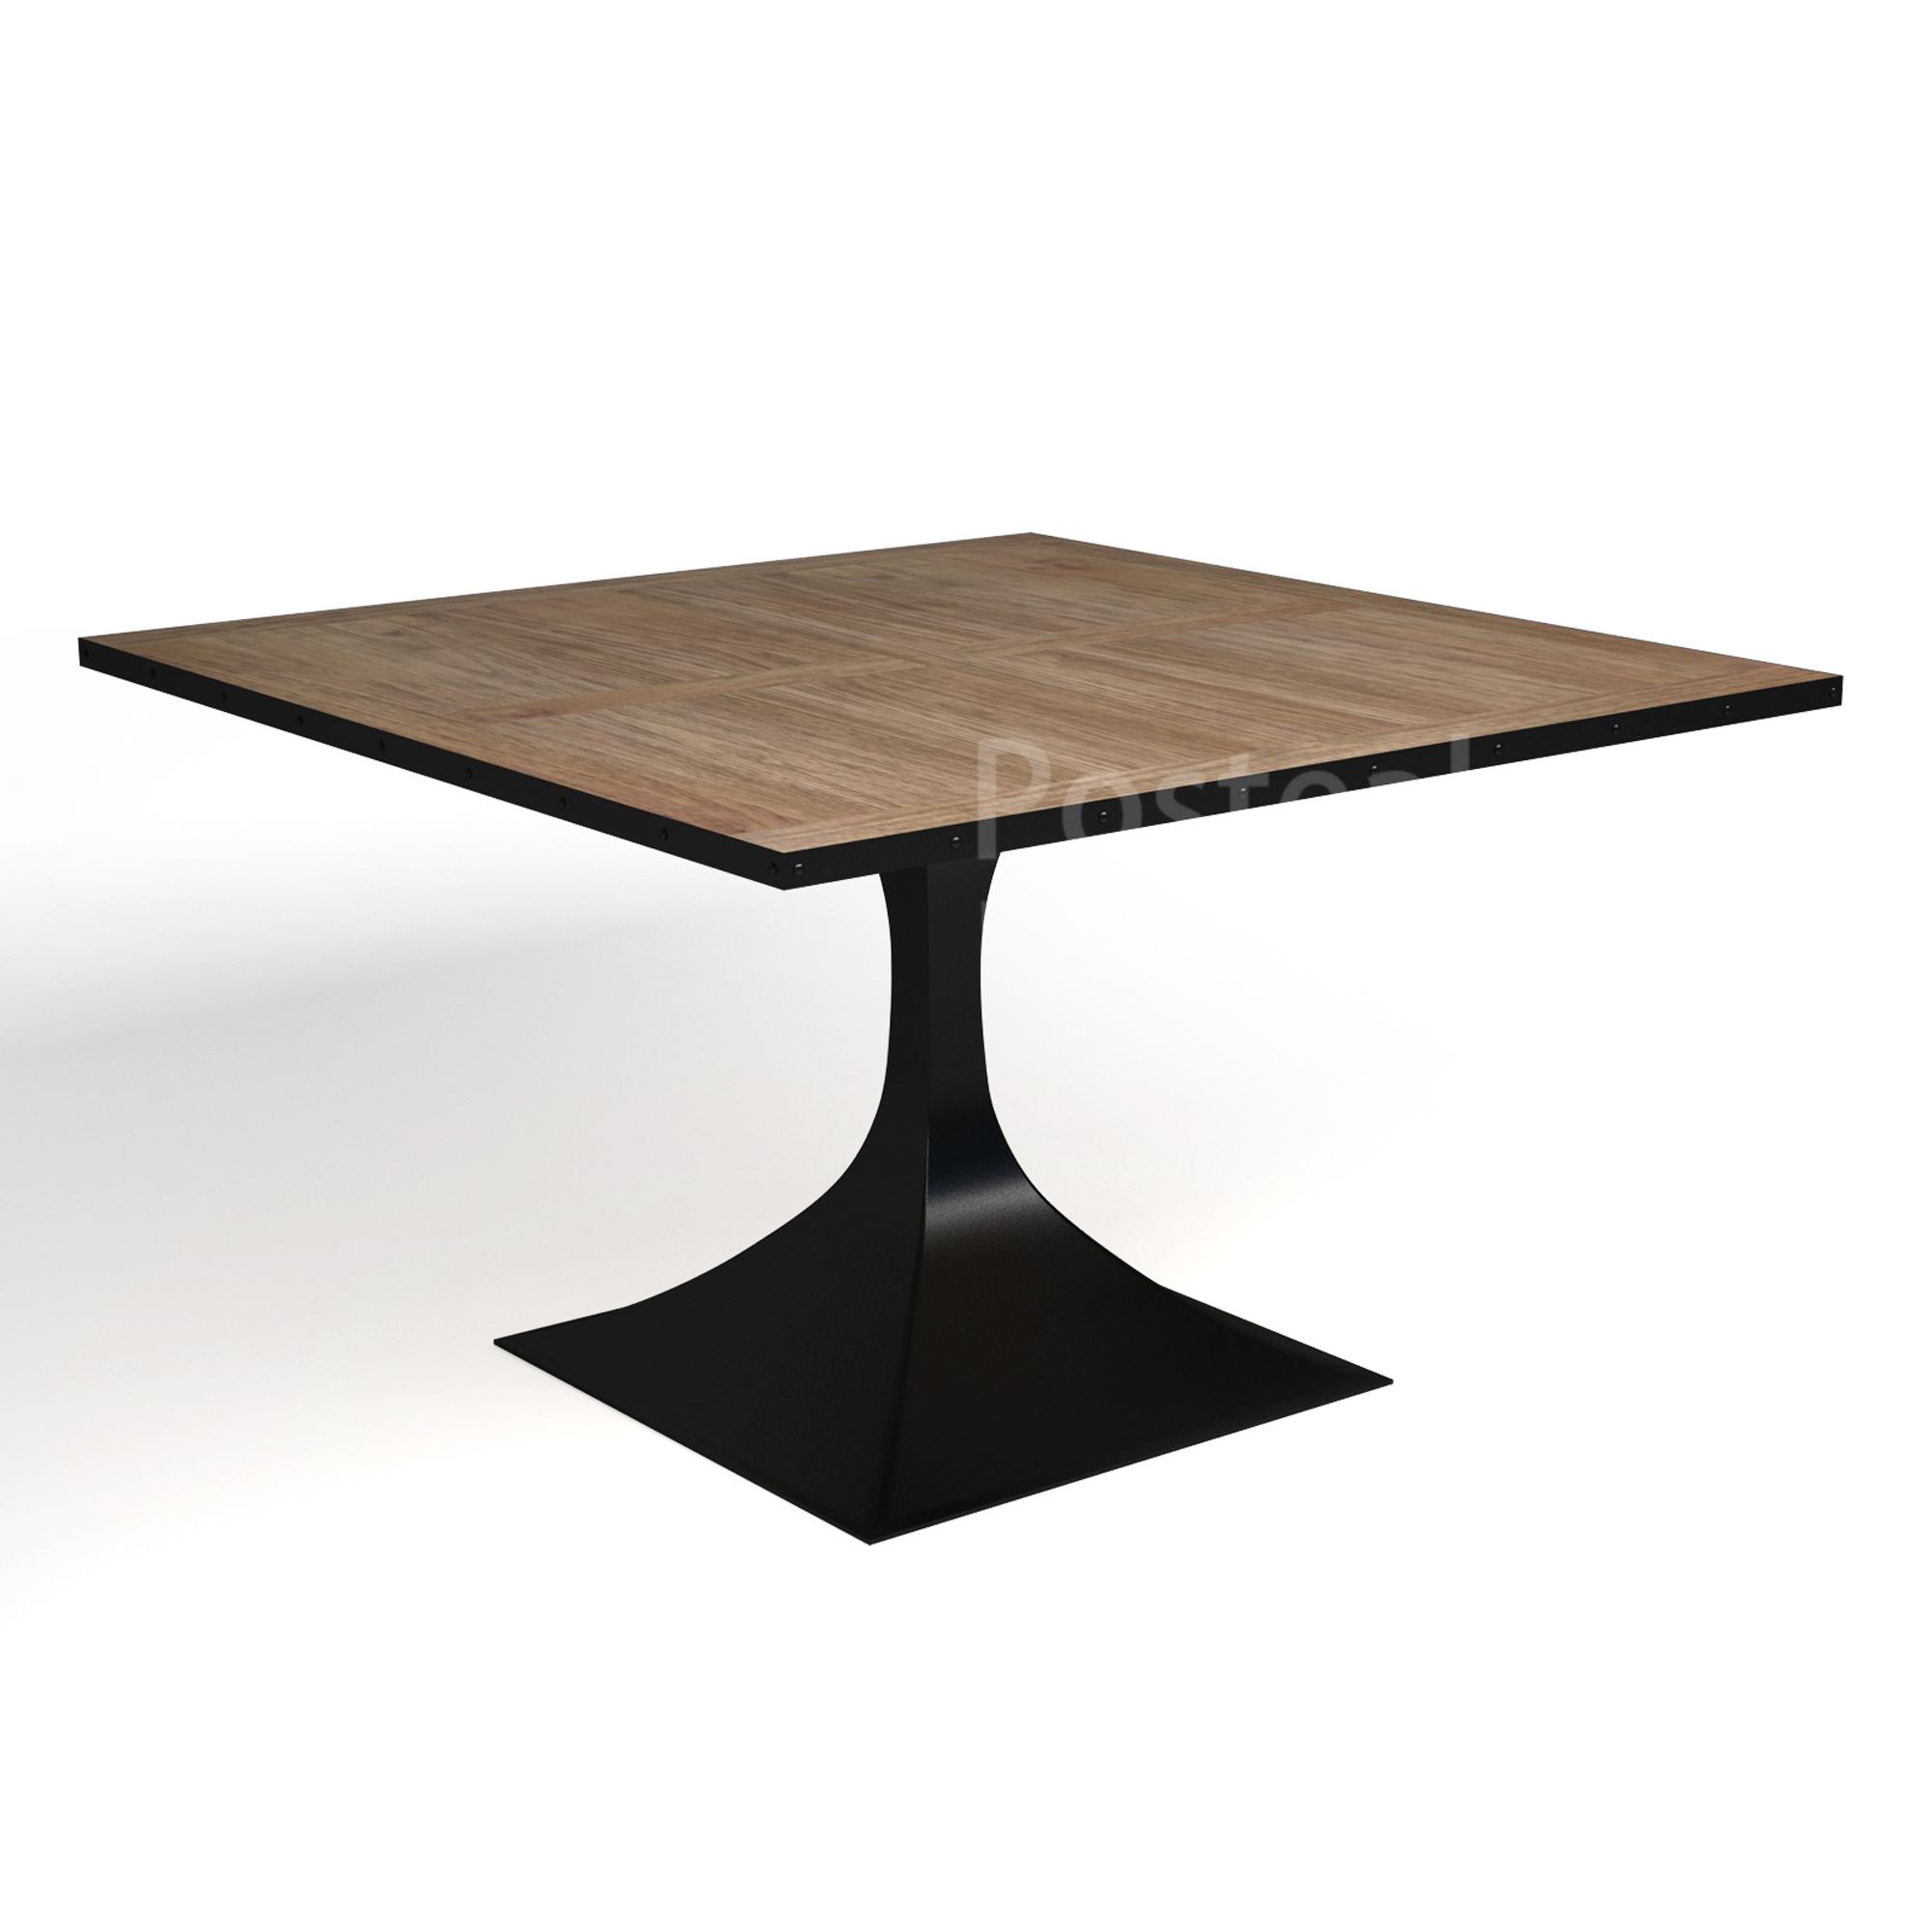 Square Rectangular Modern Dining Table Legs Industrial: Single Square Metal Legs